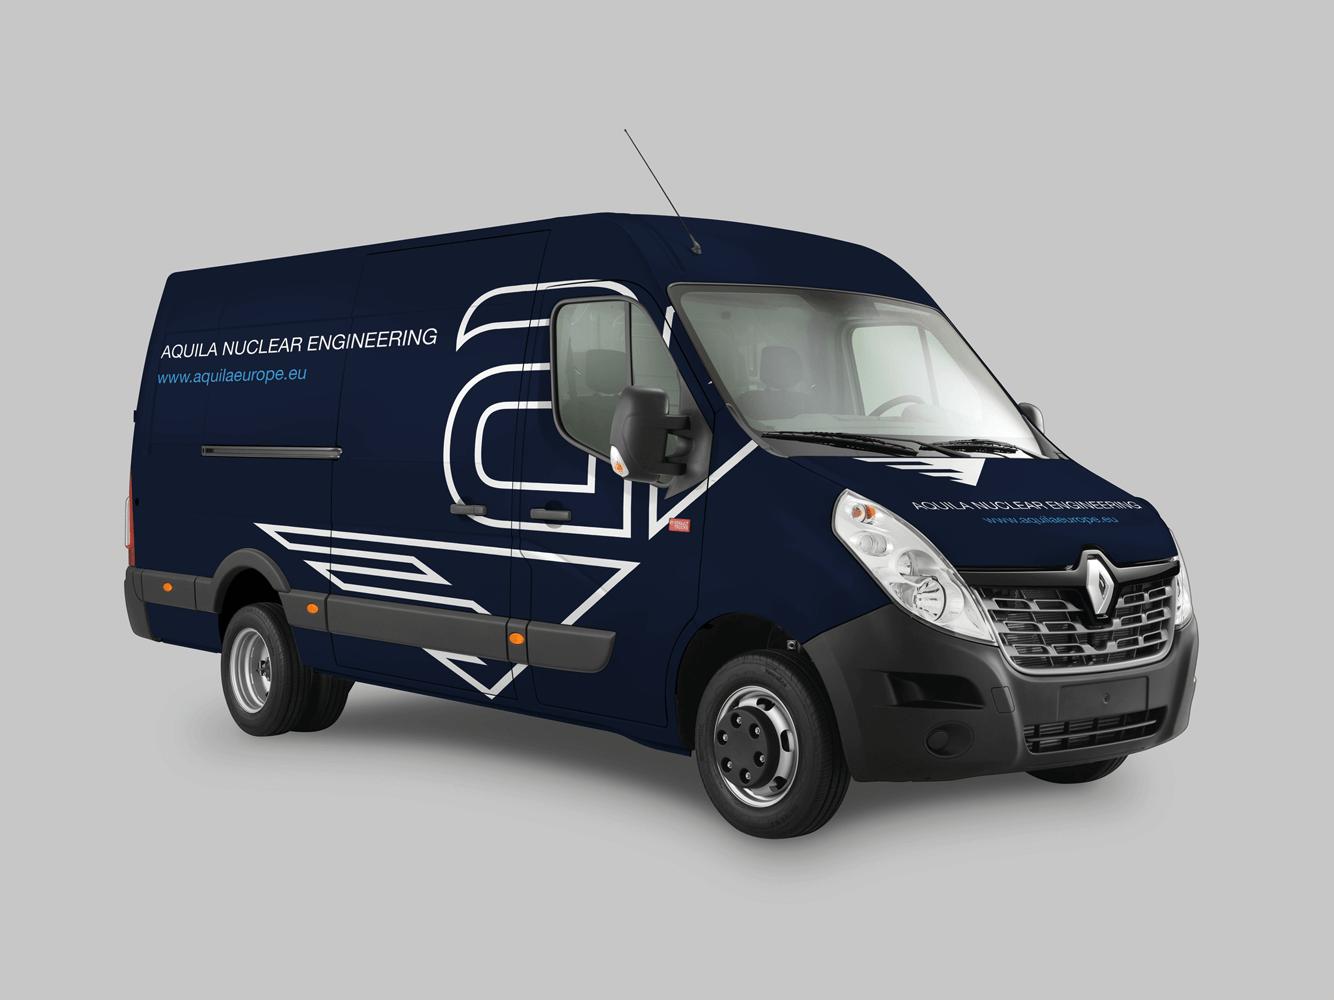 Aquila Nuclear Engineering | Livery | Car Wrap | Van | Branding